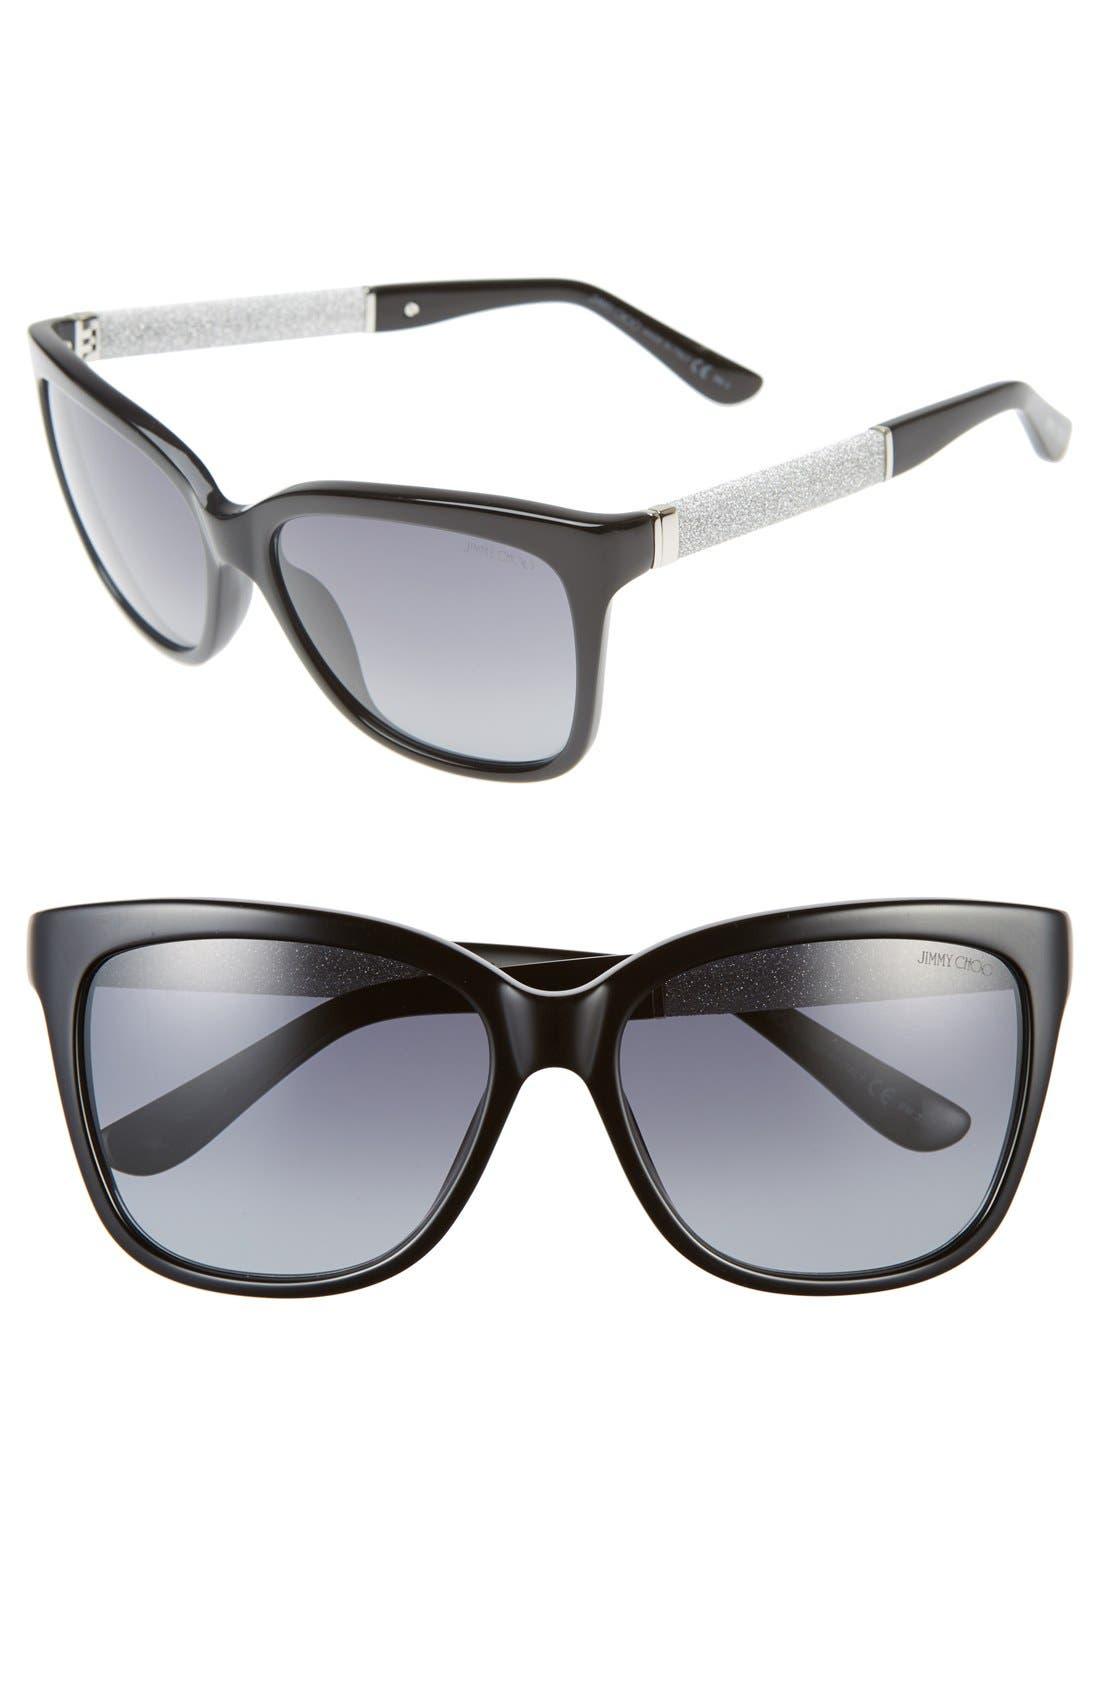 Jimmy Choo 'Coras' 56mm Retro Sunglasses